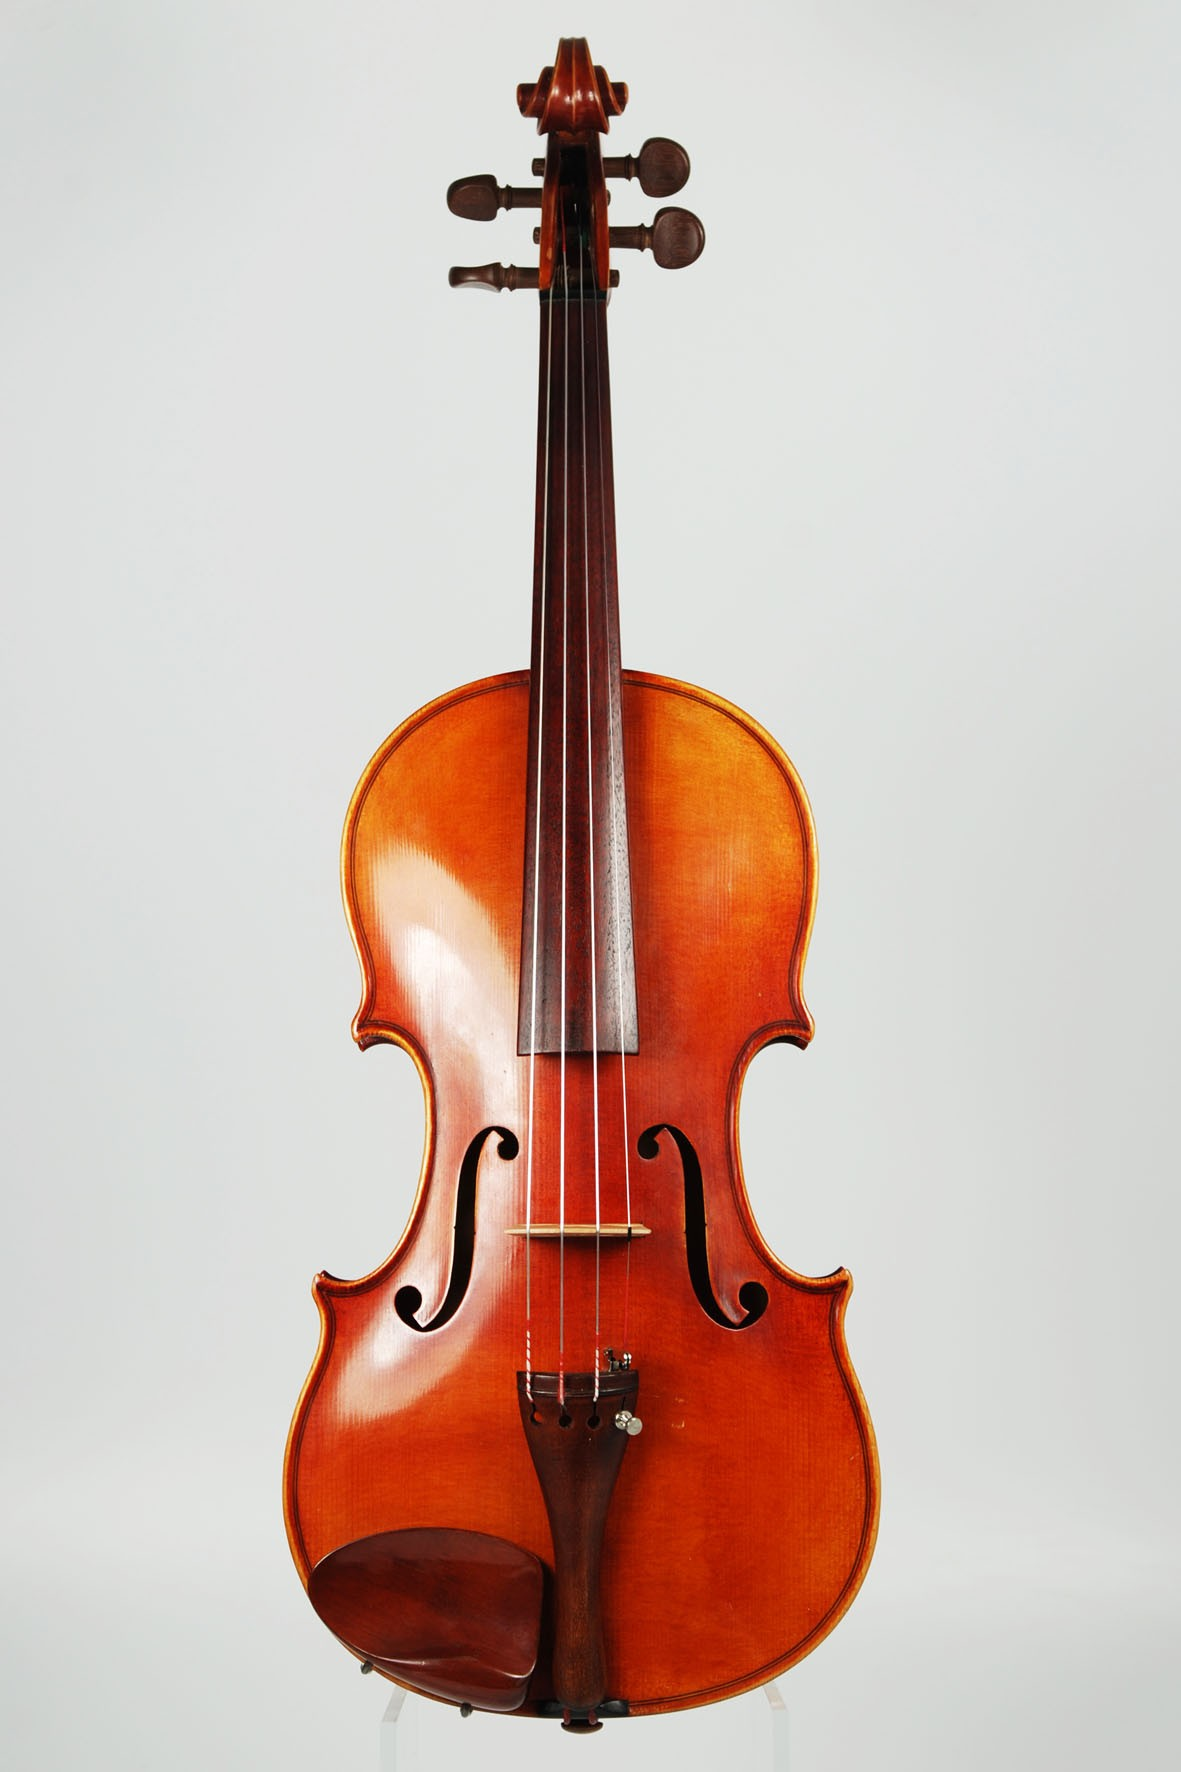 sweet sounding violin